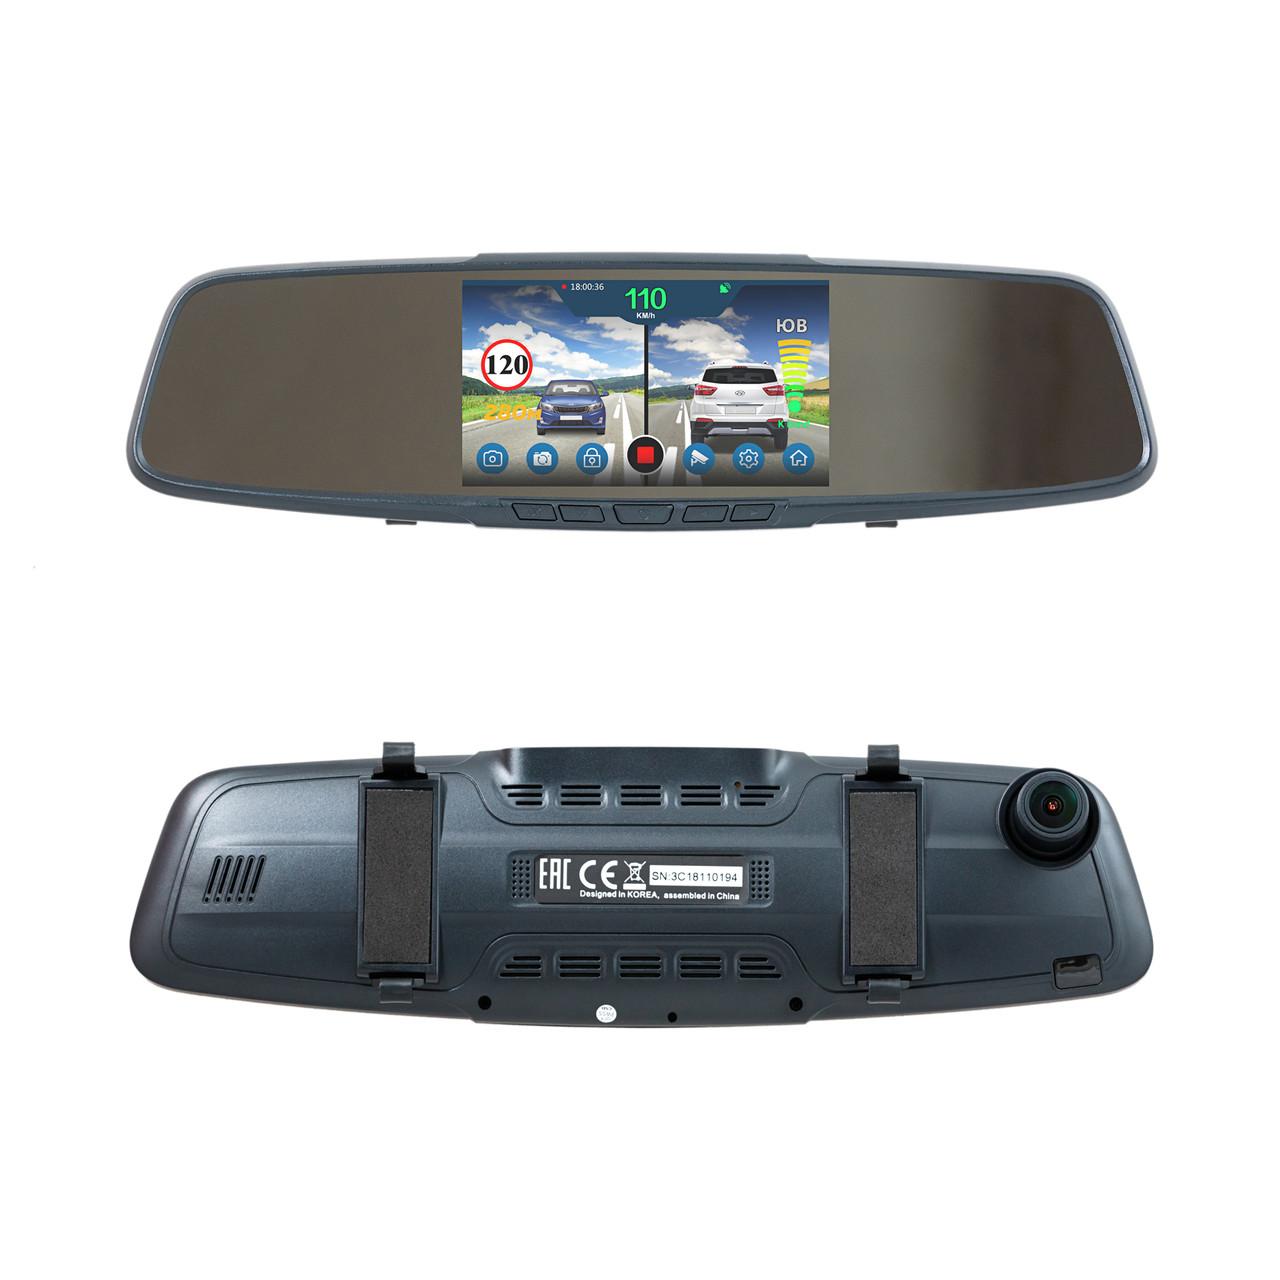 Комбинированное устройство Playme VEGA (зеркало-накладка)